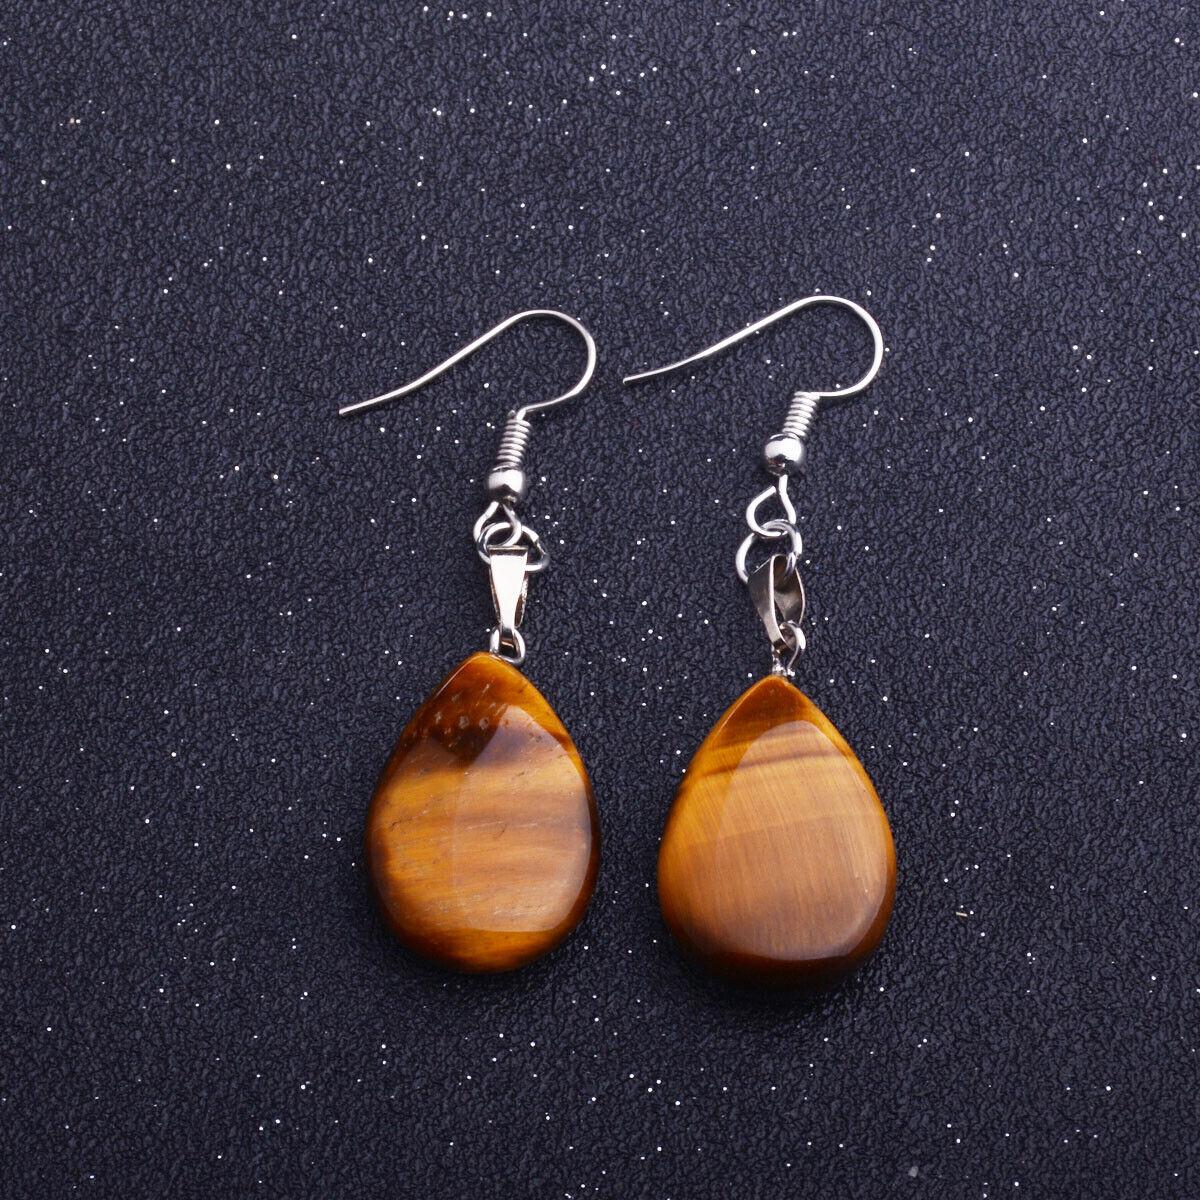 Vintage-Earring-Stud-Hook-Nature-Stone-Dangle-Jewelry-Retro-Girl-Women-Gift-Hot